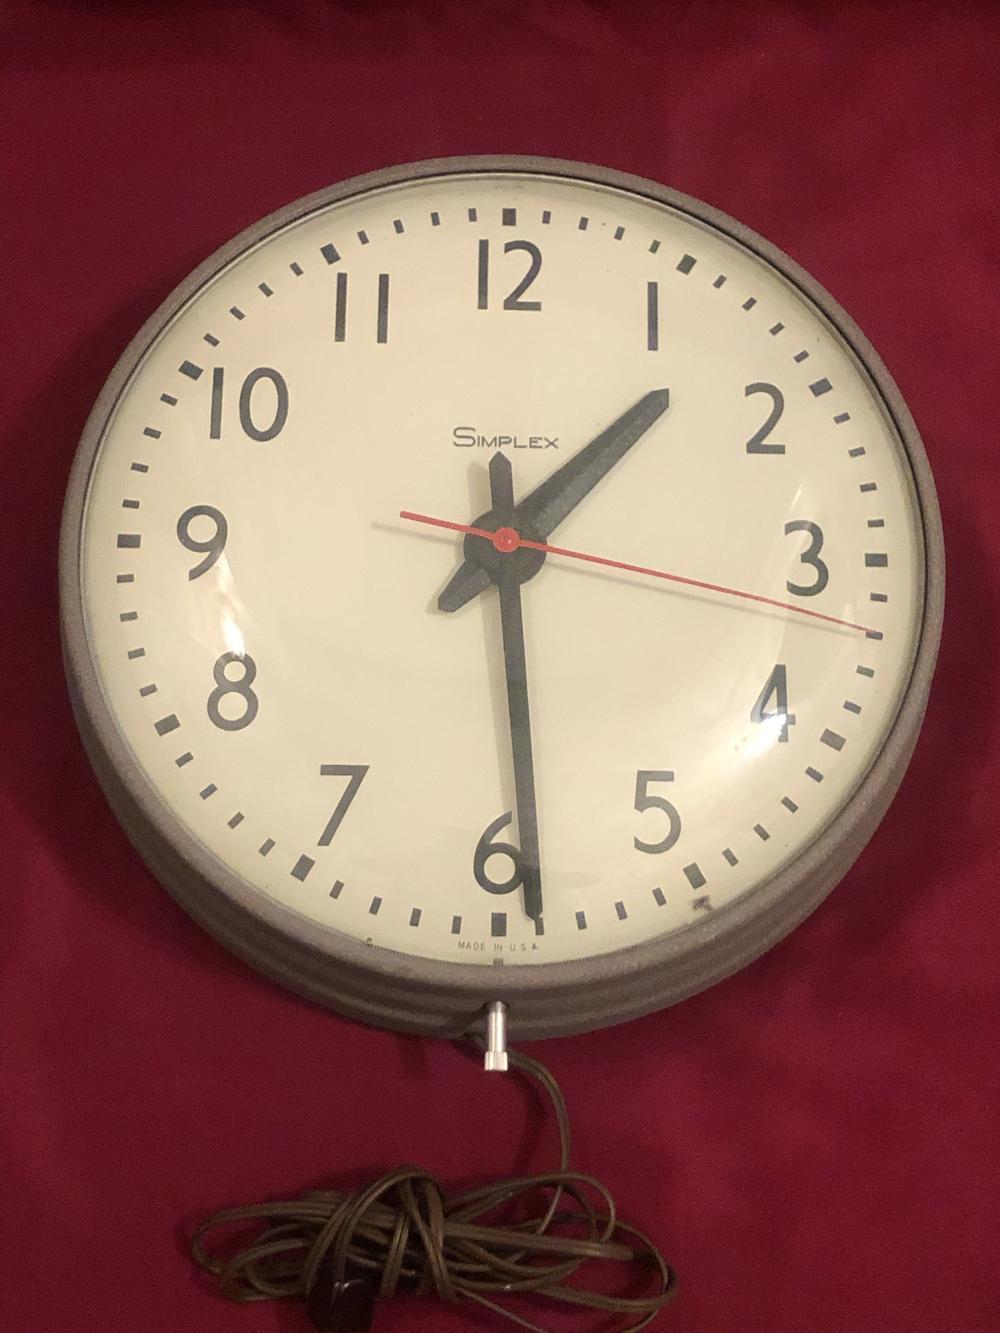 Vintage Simplex glass front school clock